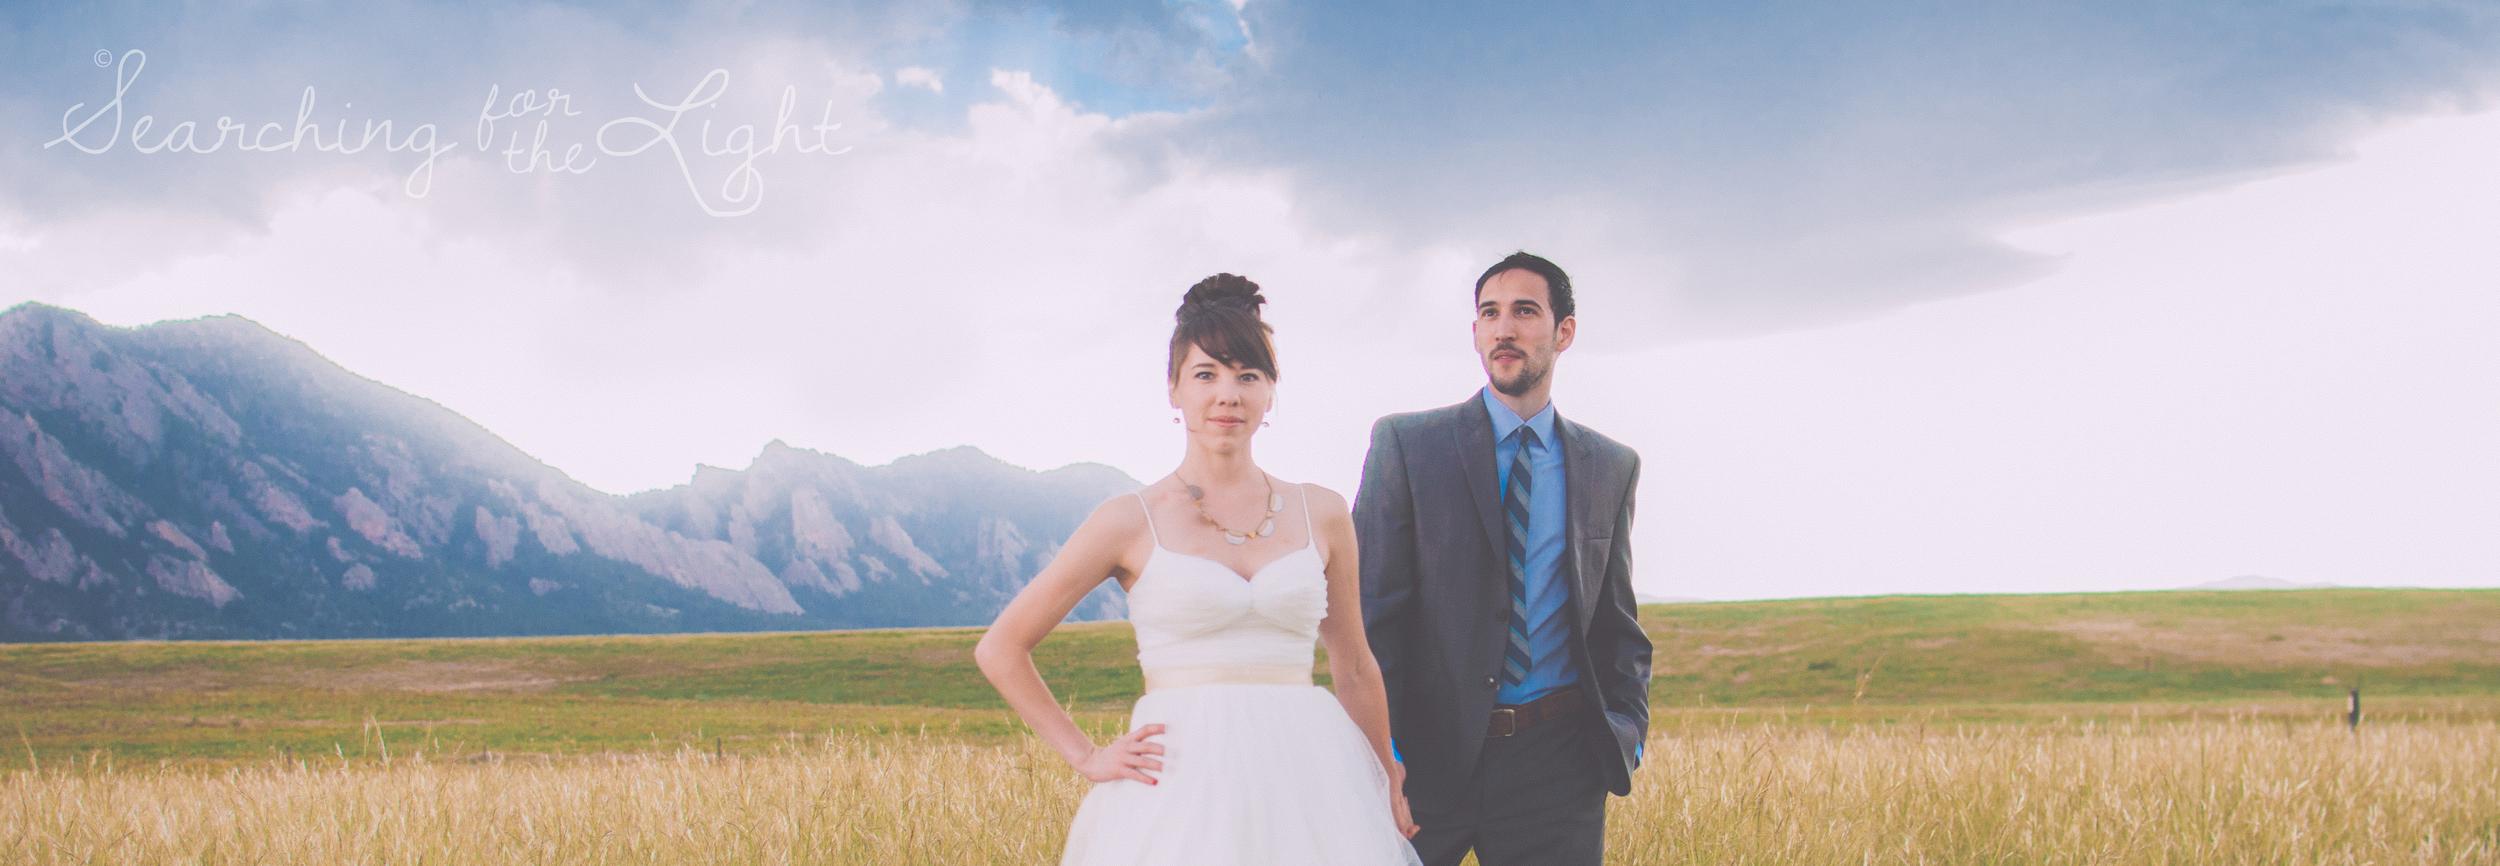 colorado wedding photographer, denver wedding photographer